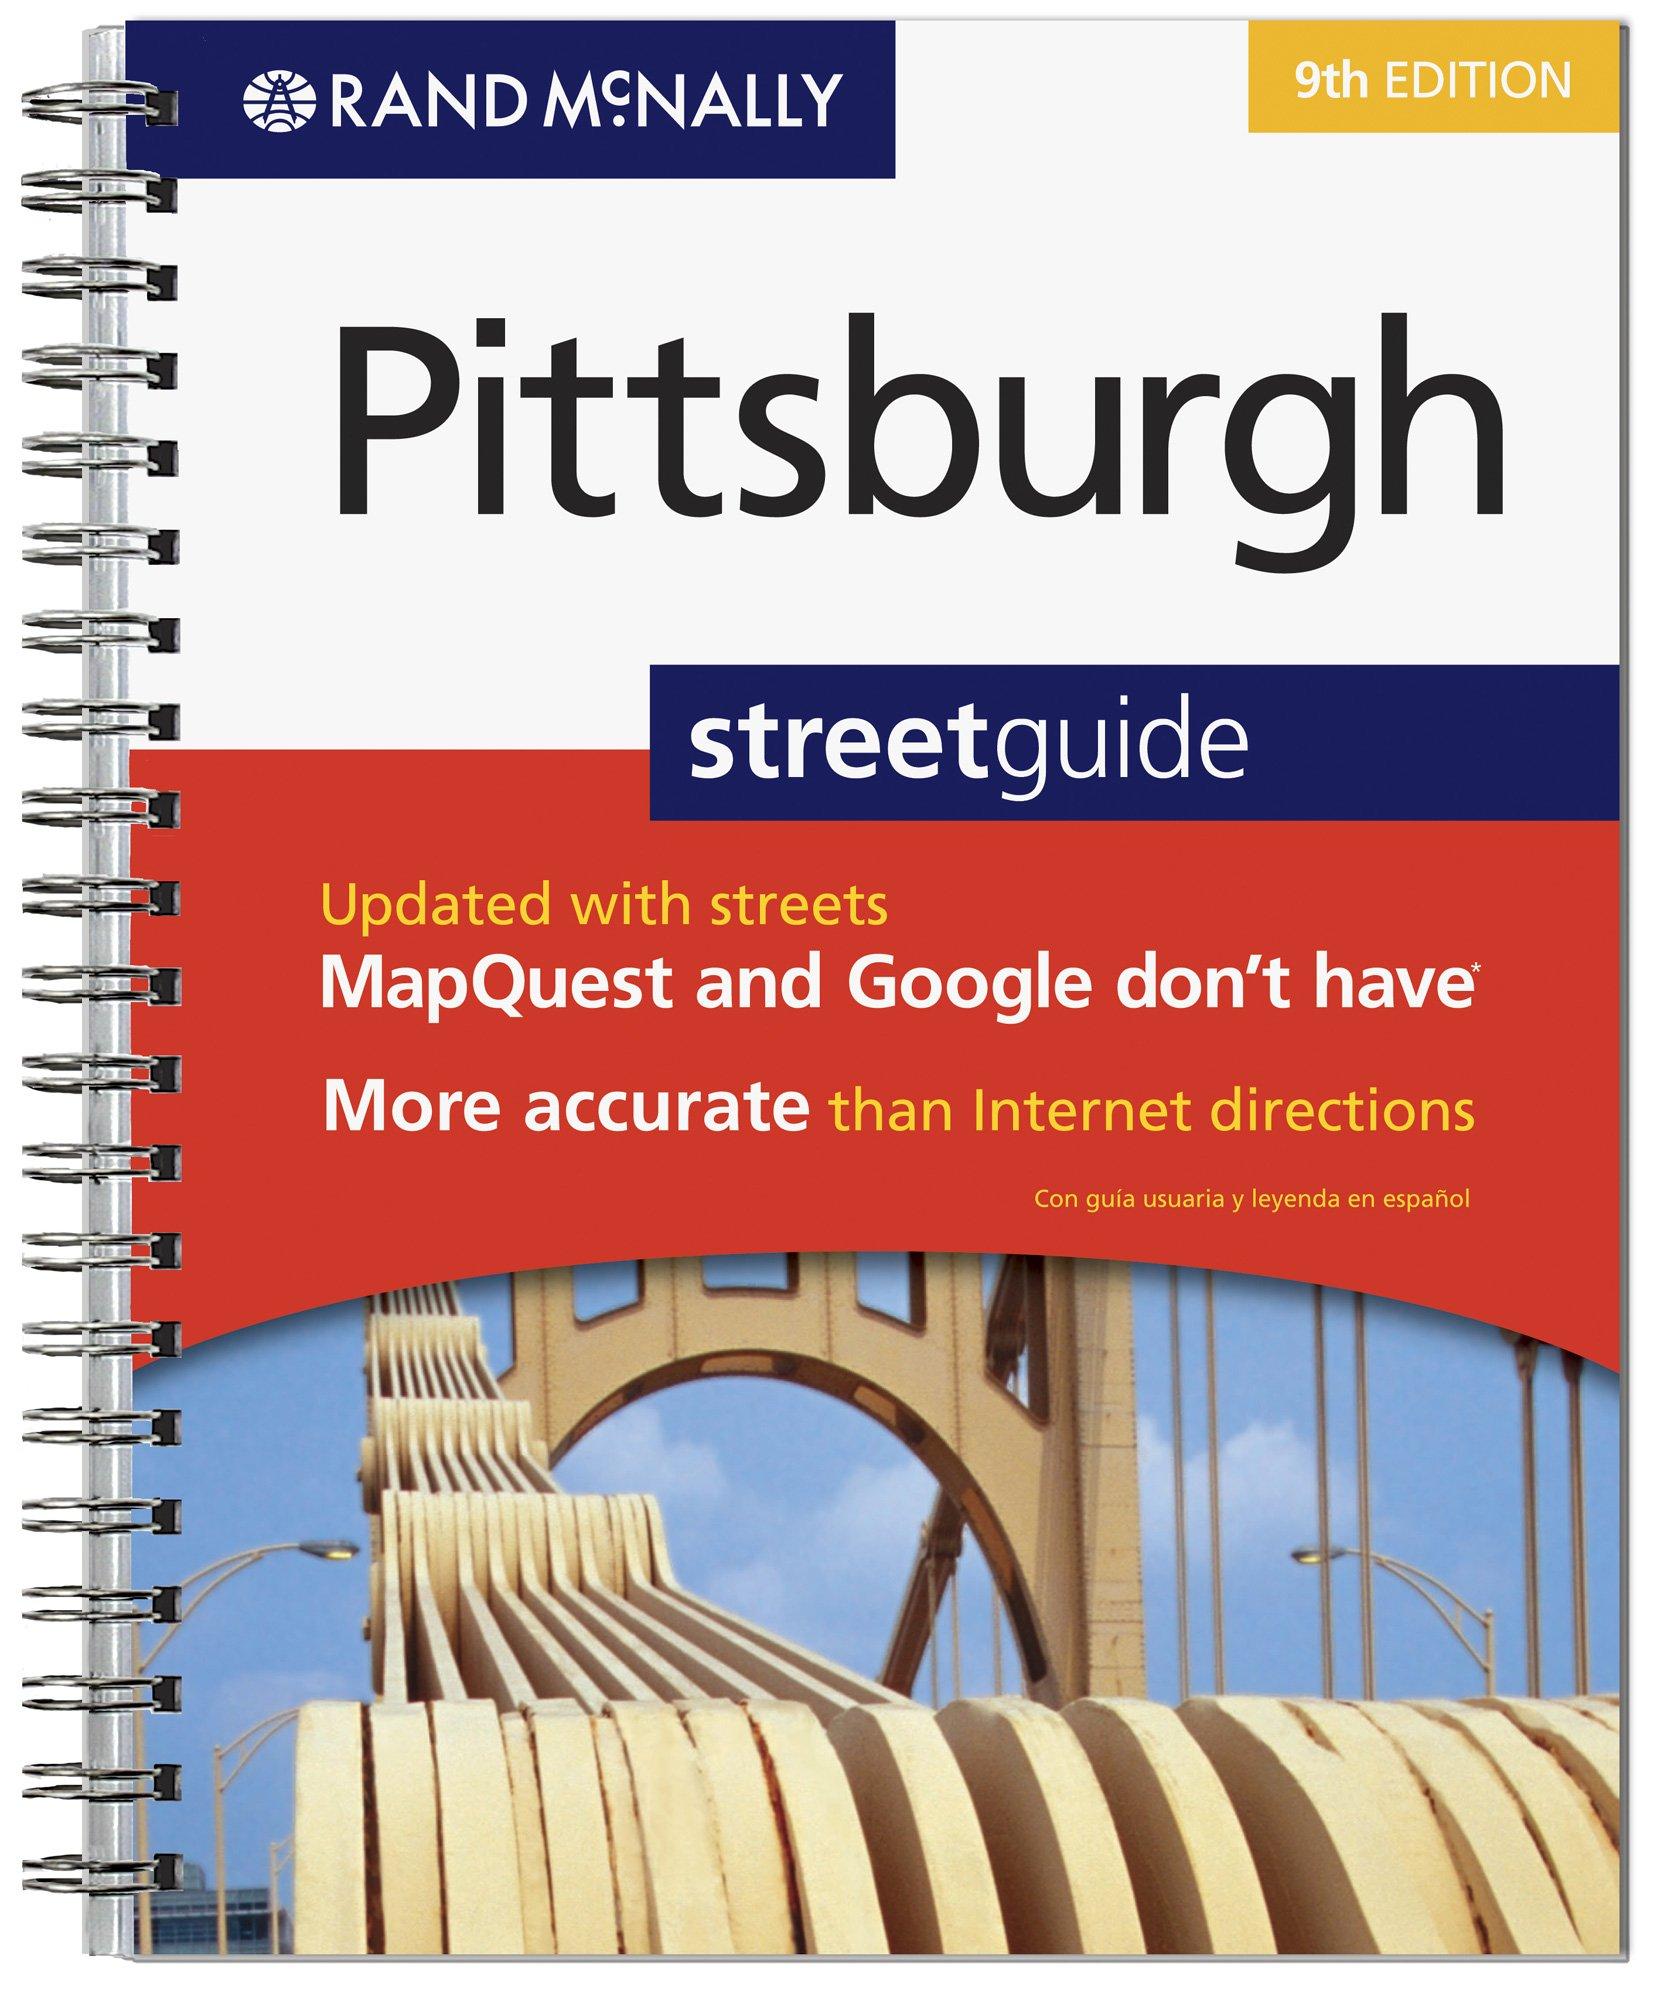 Amazon pittsburgh pennsylvania books rand mcnally pittsburgh street guide fandeluxe Choice Image